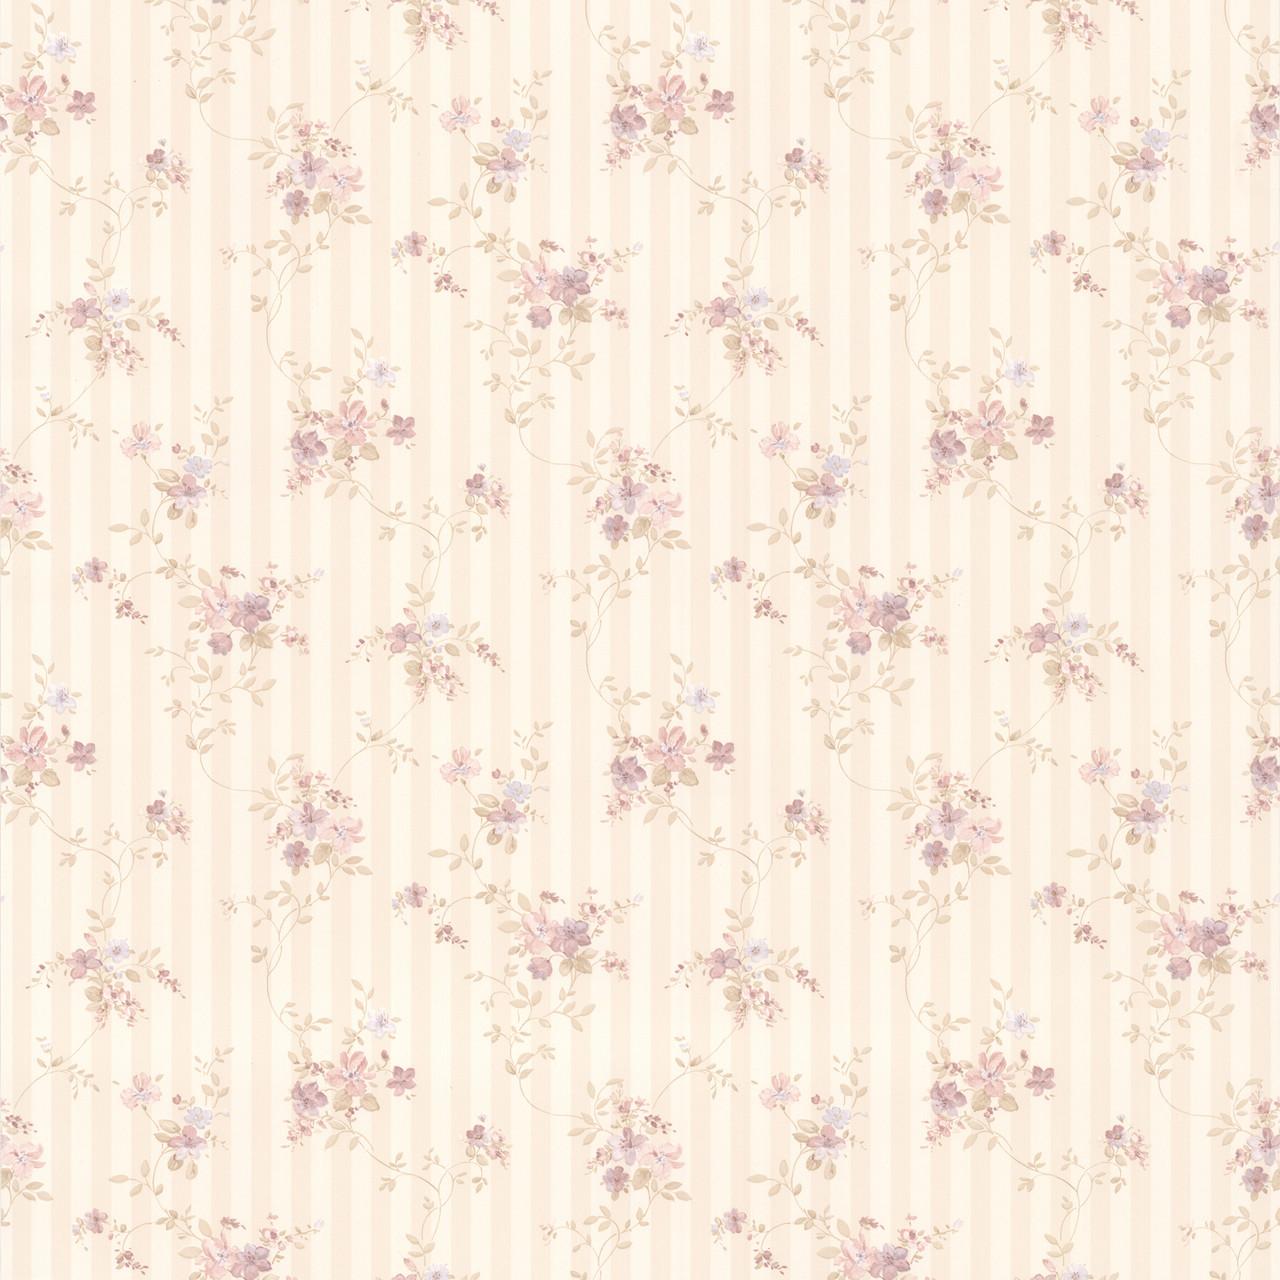 436 66373 Delilah Mauve Floral Stripe Wallpaper